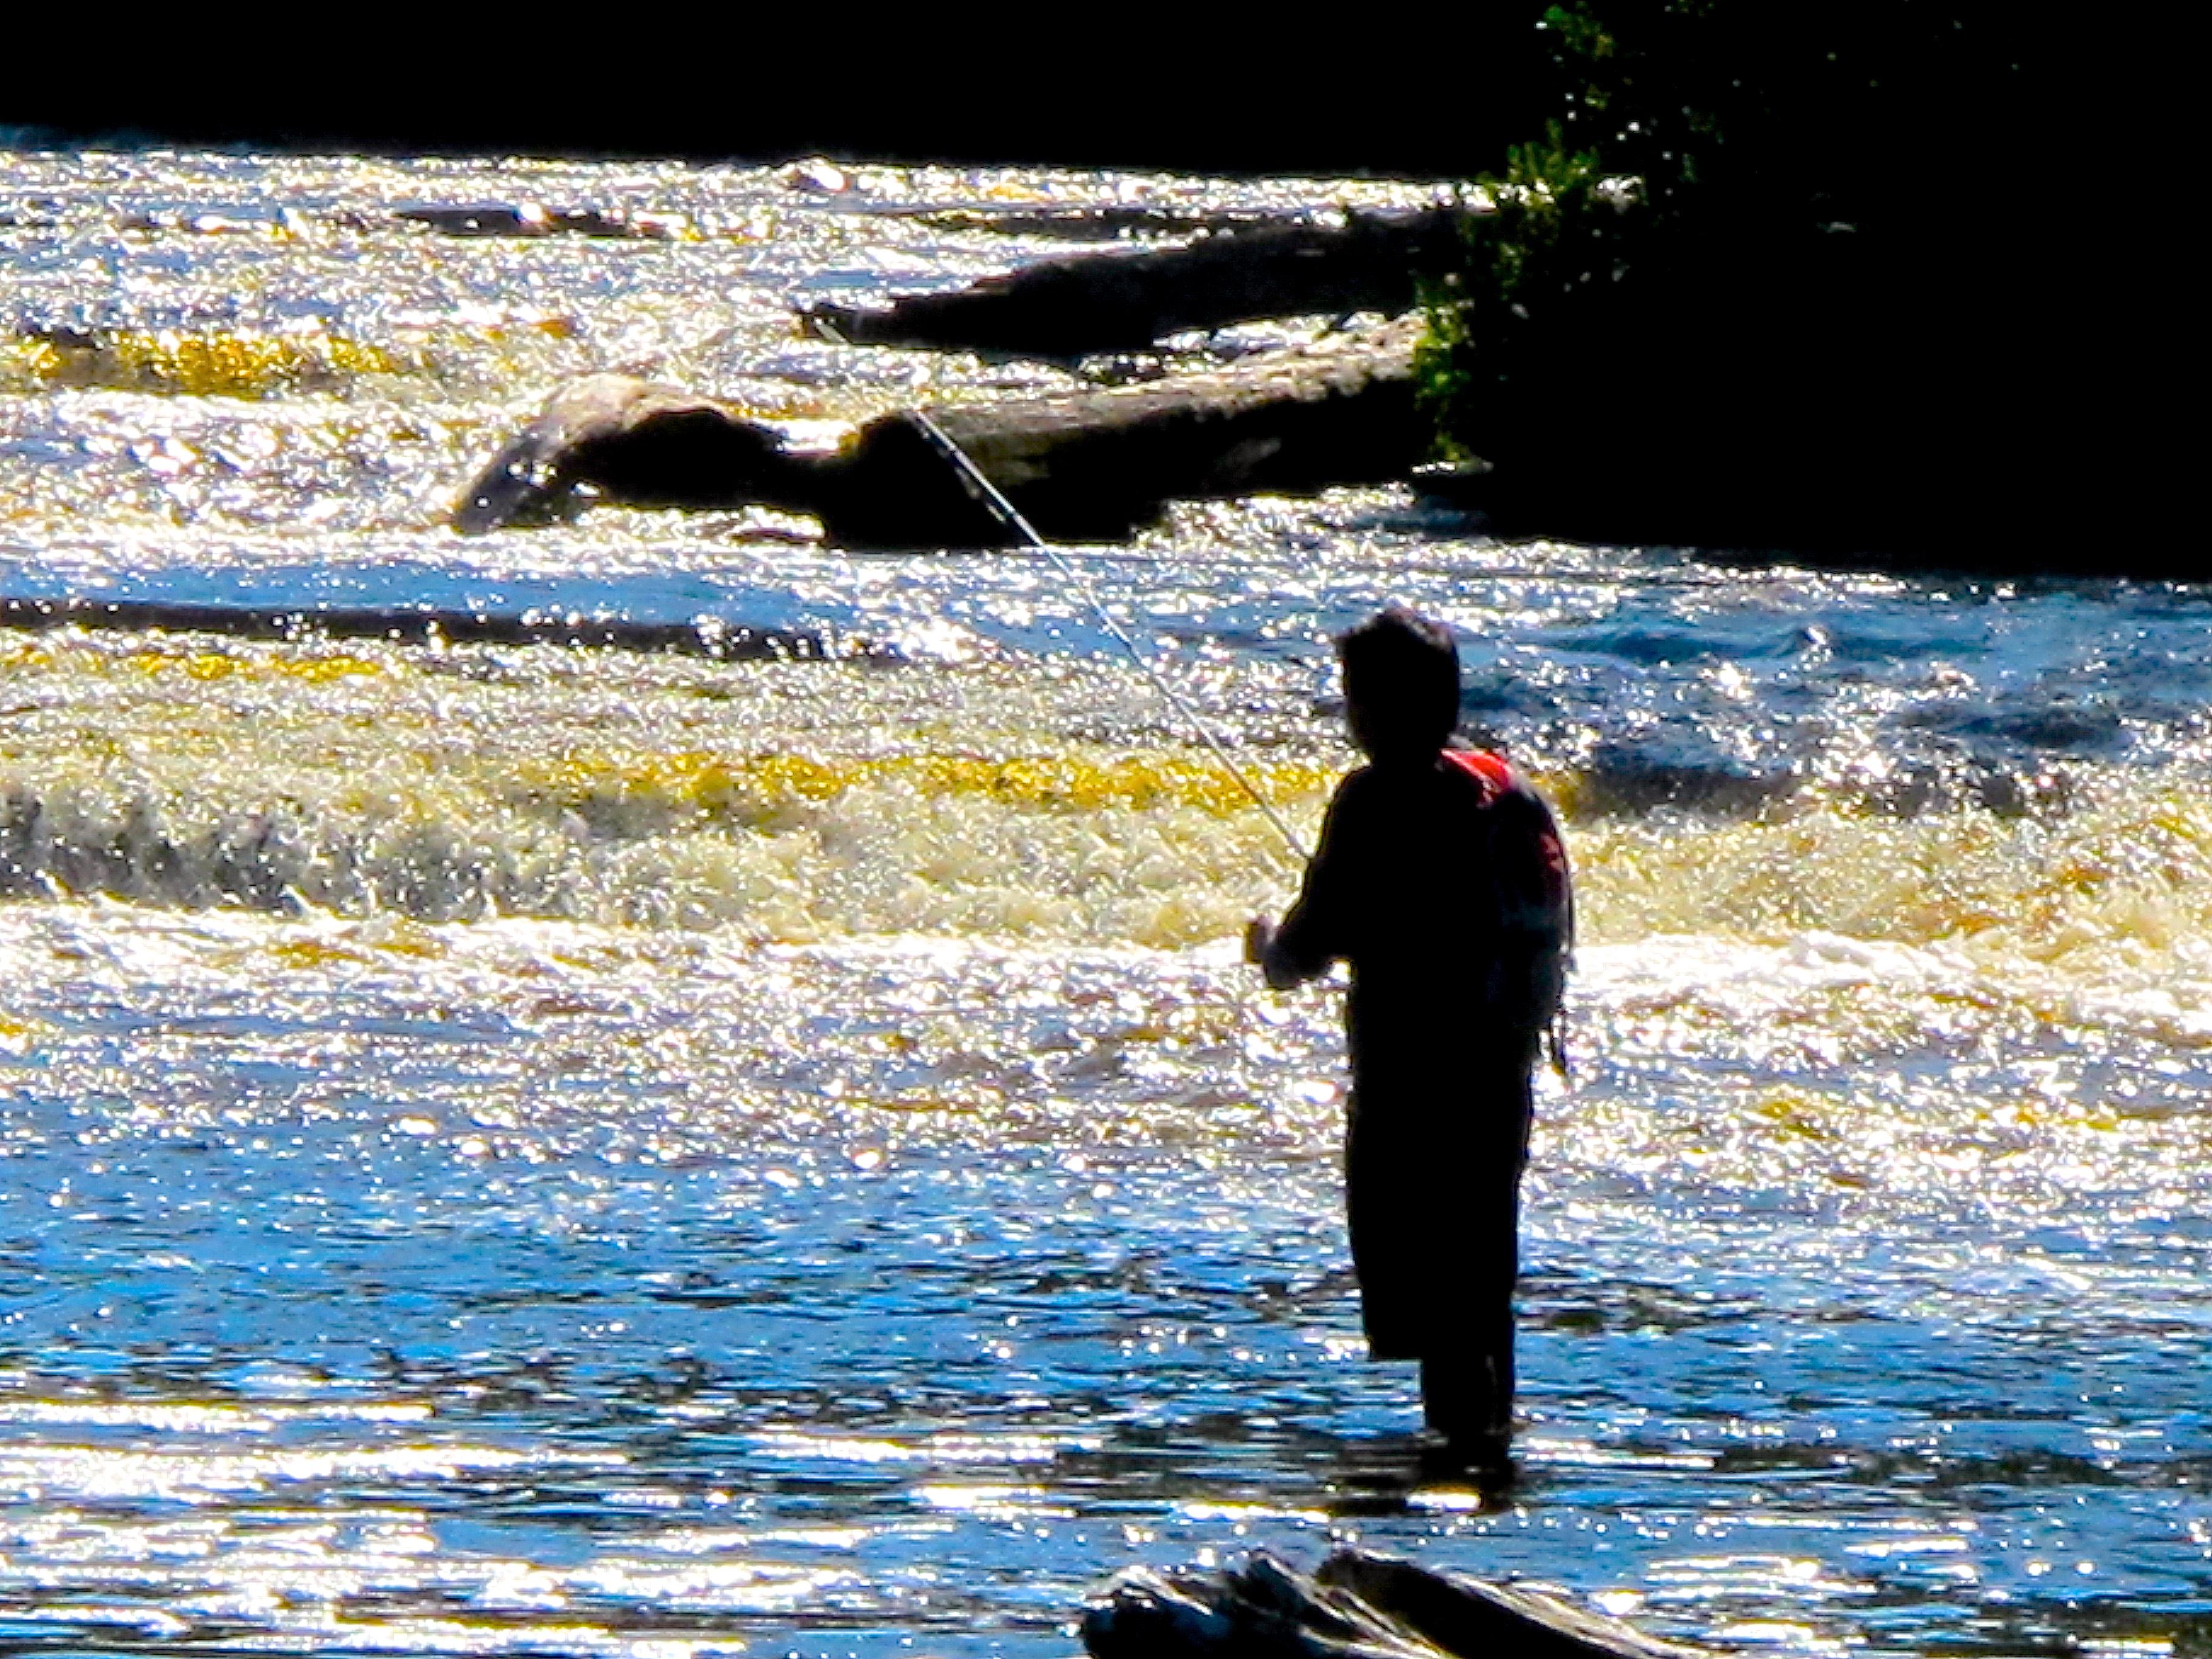 Fishing on Tahquamenon River